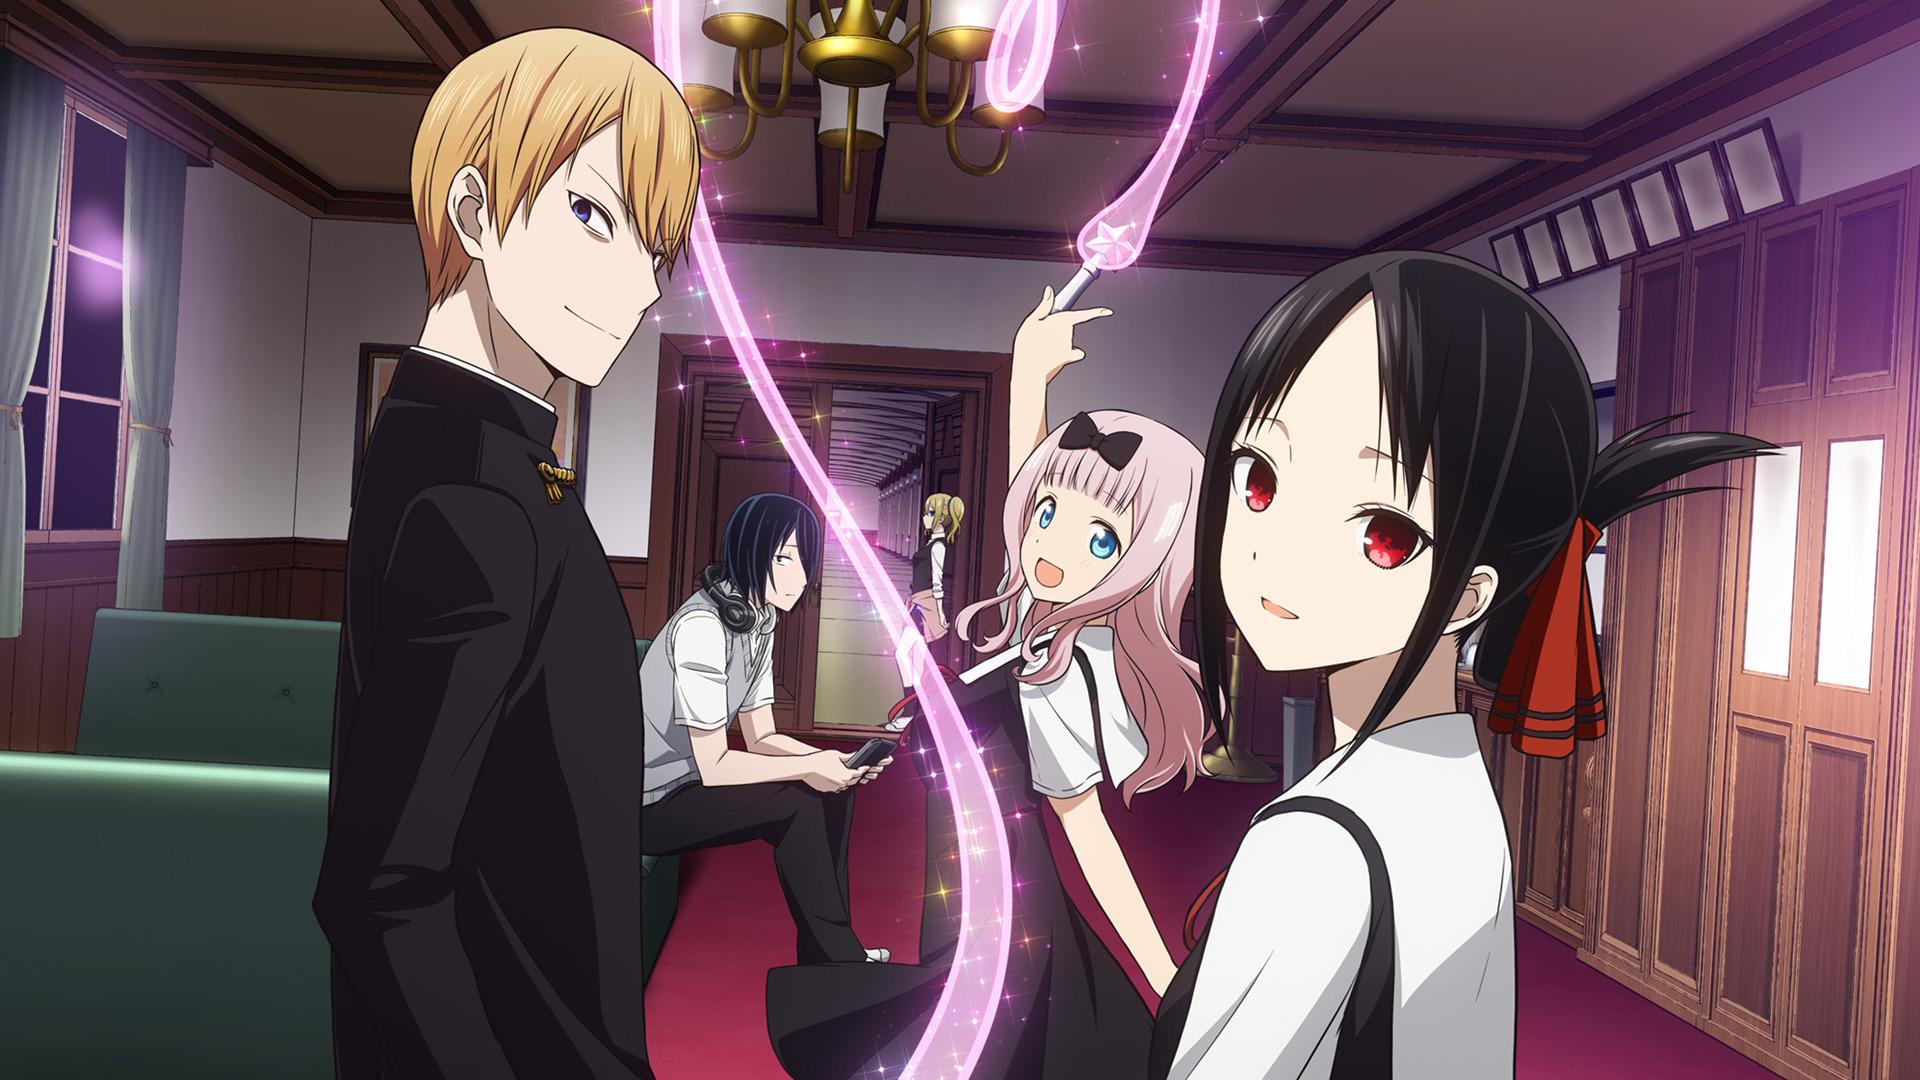 Anime Госпожа Кагуя: В любви как на войне